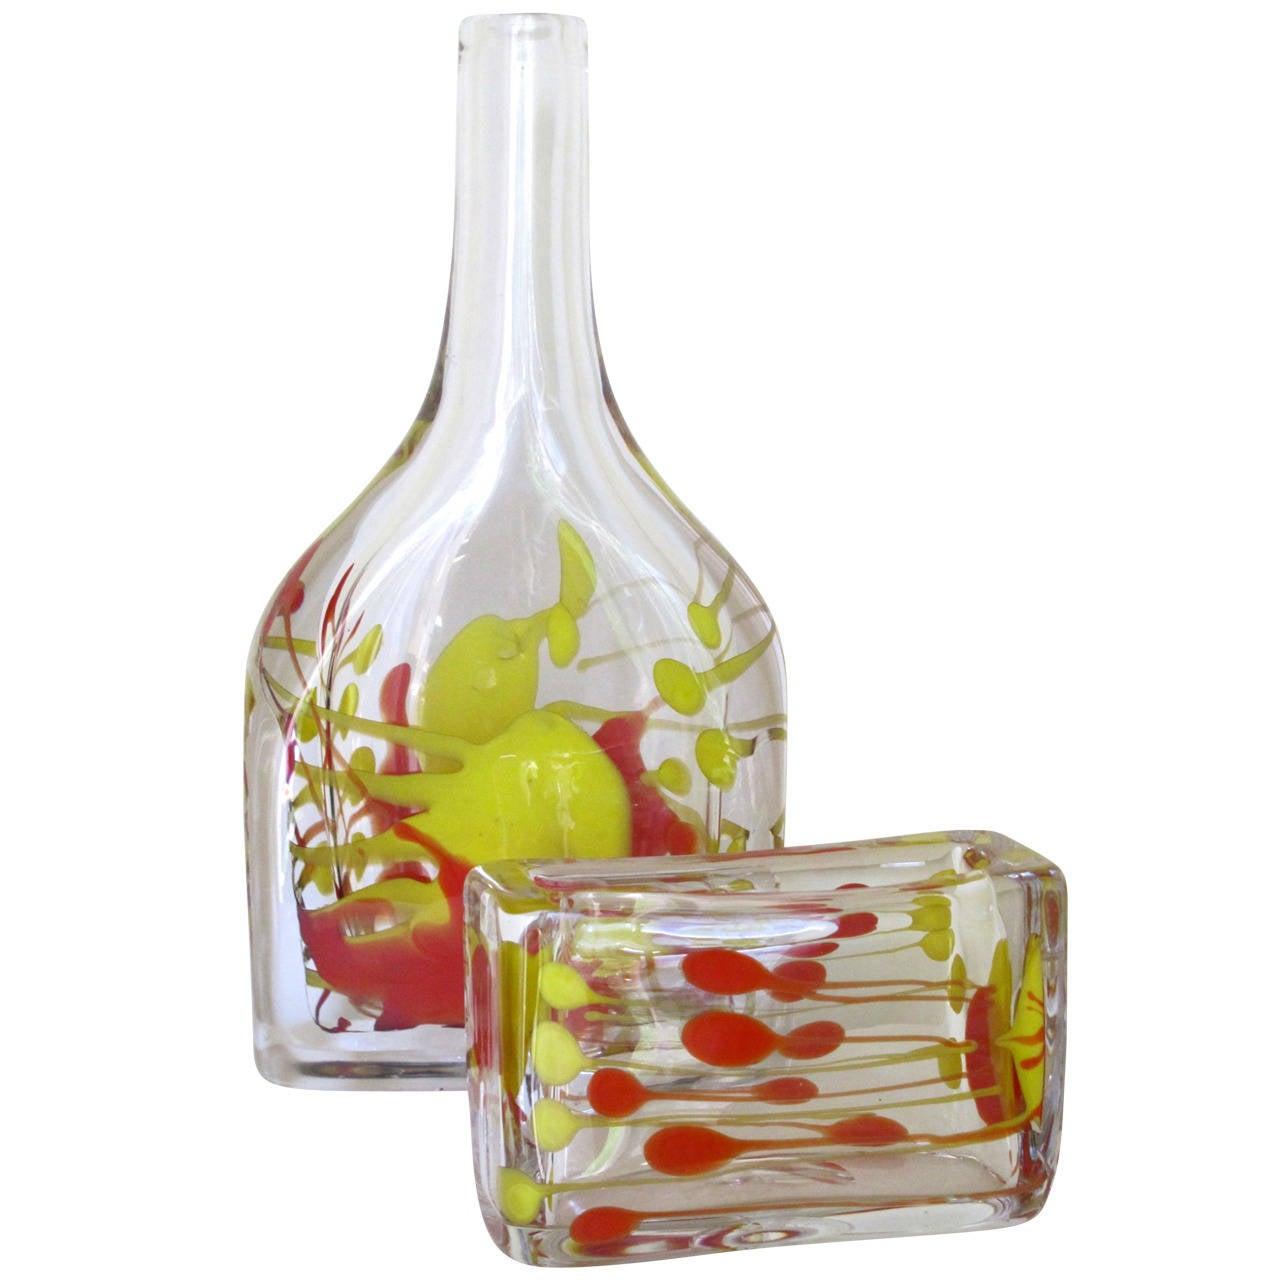 One-Off Mid-Century Modern Art Glass Set by Floris Meydam for Leerdam Unica